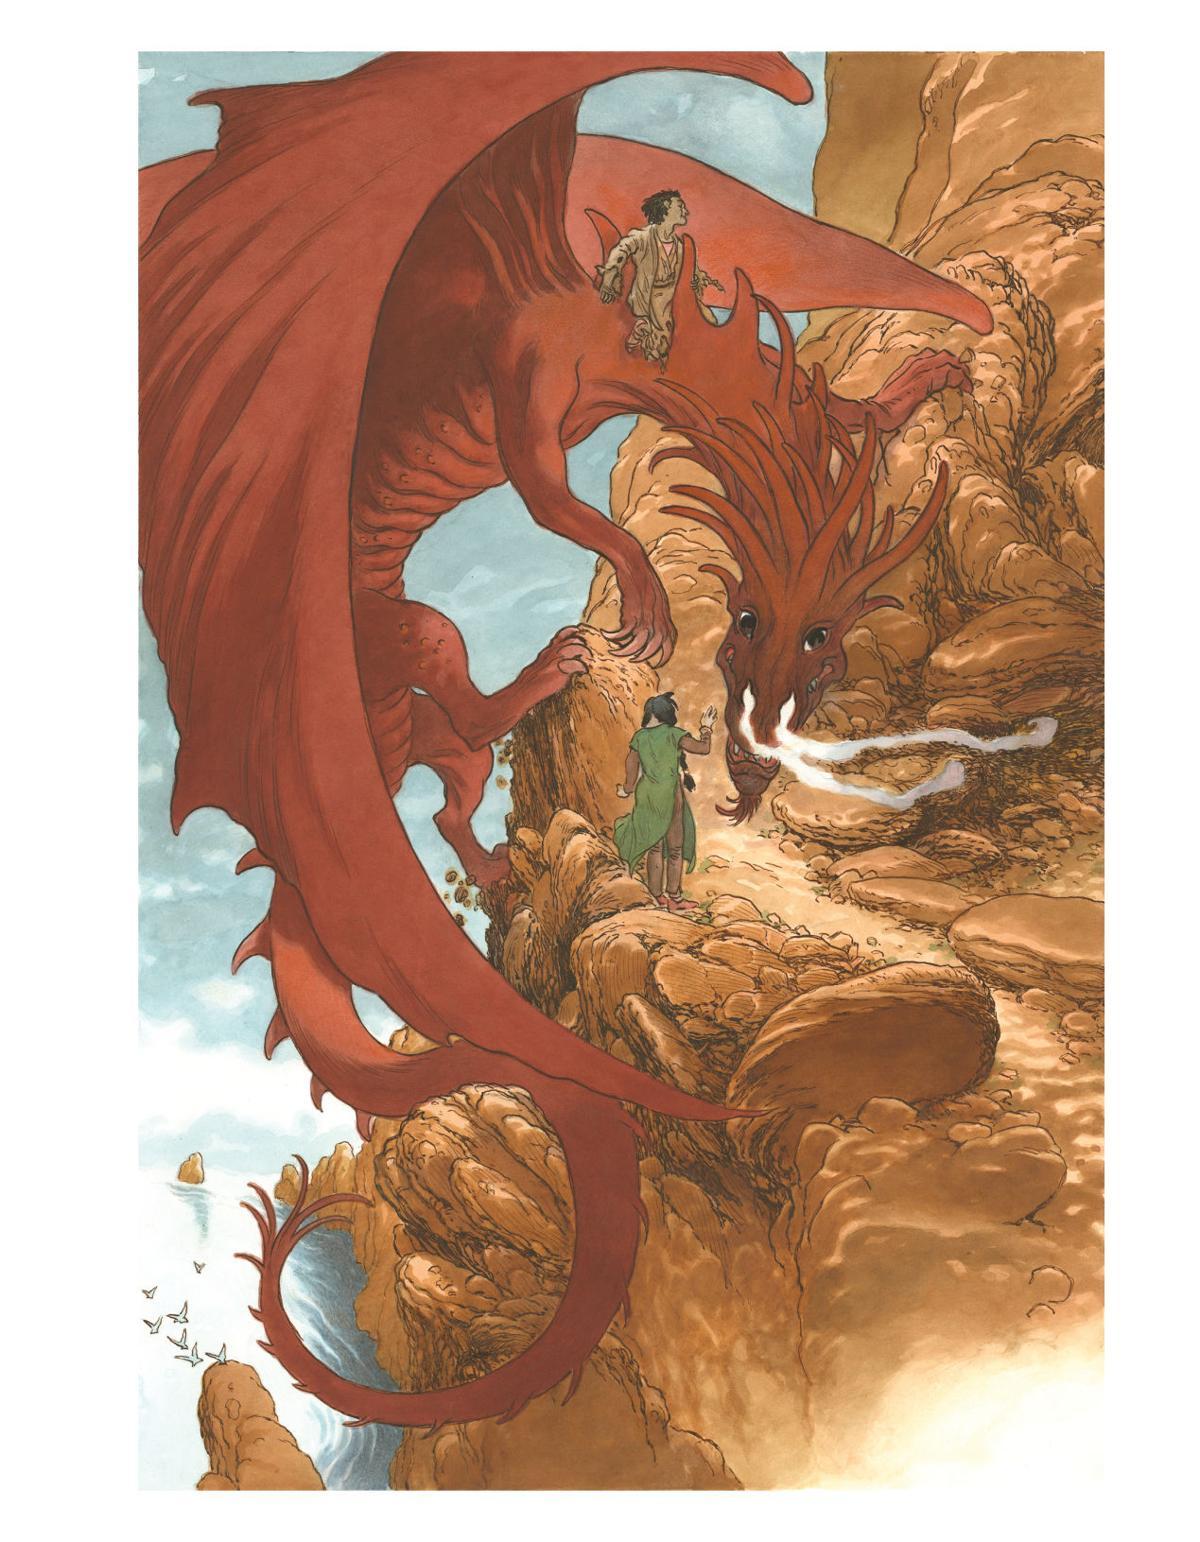 Of magic and dragons: How Lynchburg-born artist Charles Vess